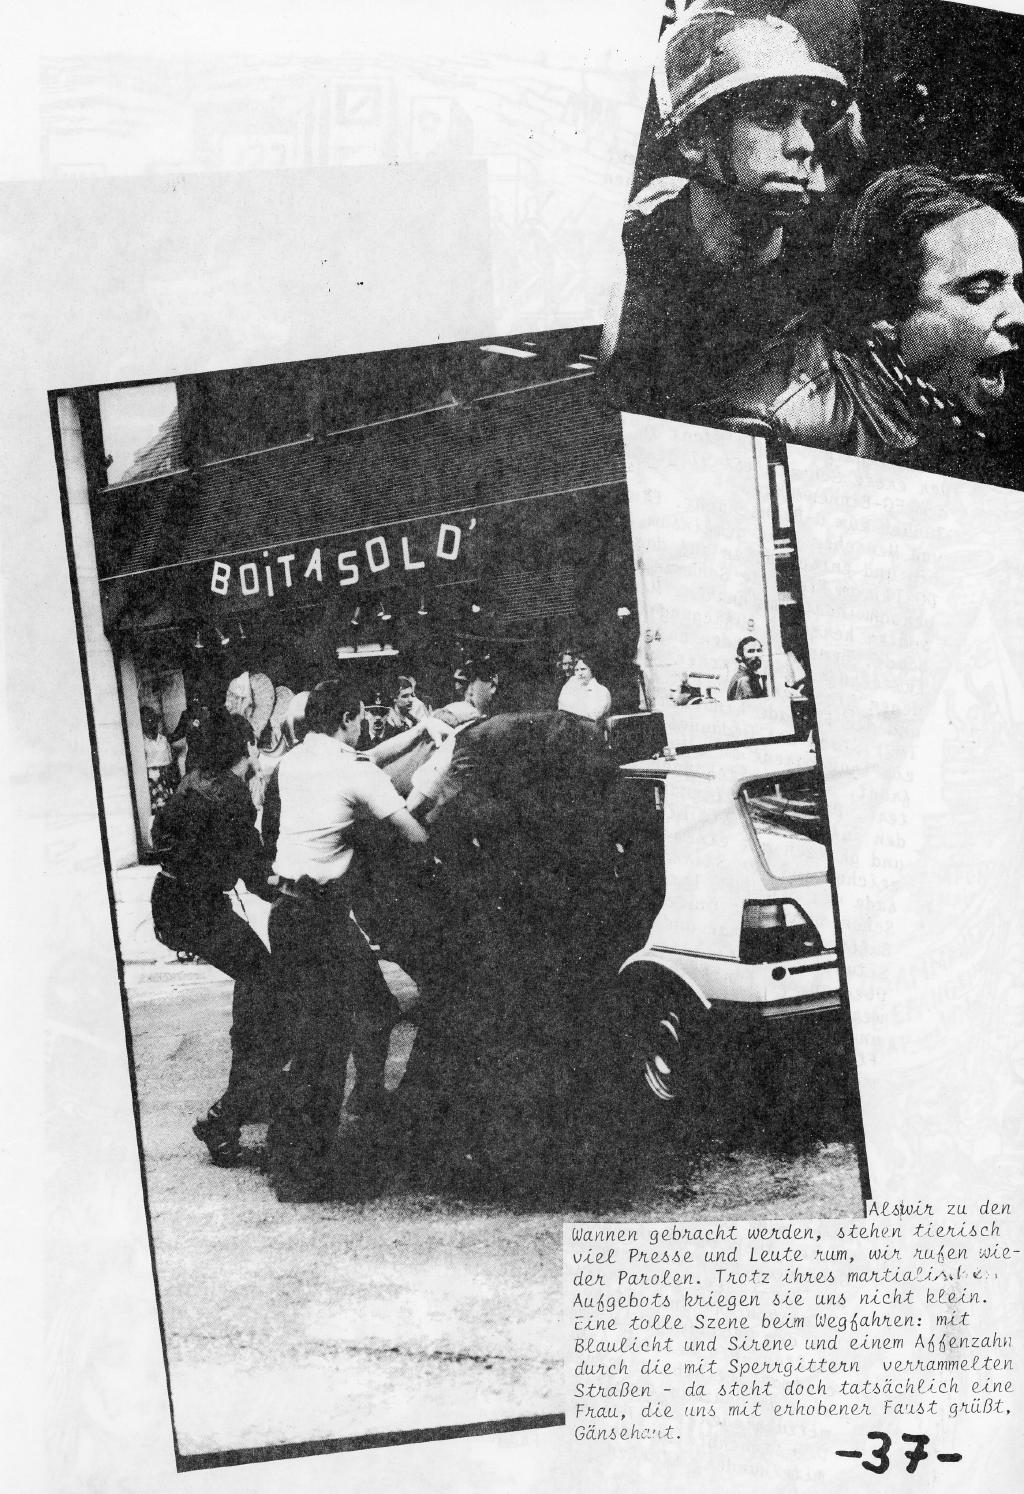 Belgien_Doku_Besetzung_EG_Kommission_1989_039